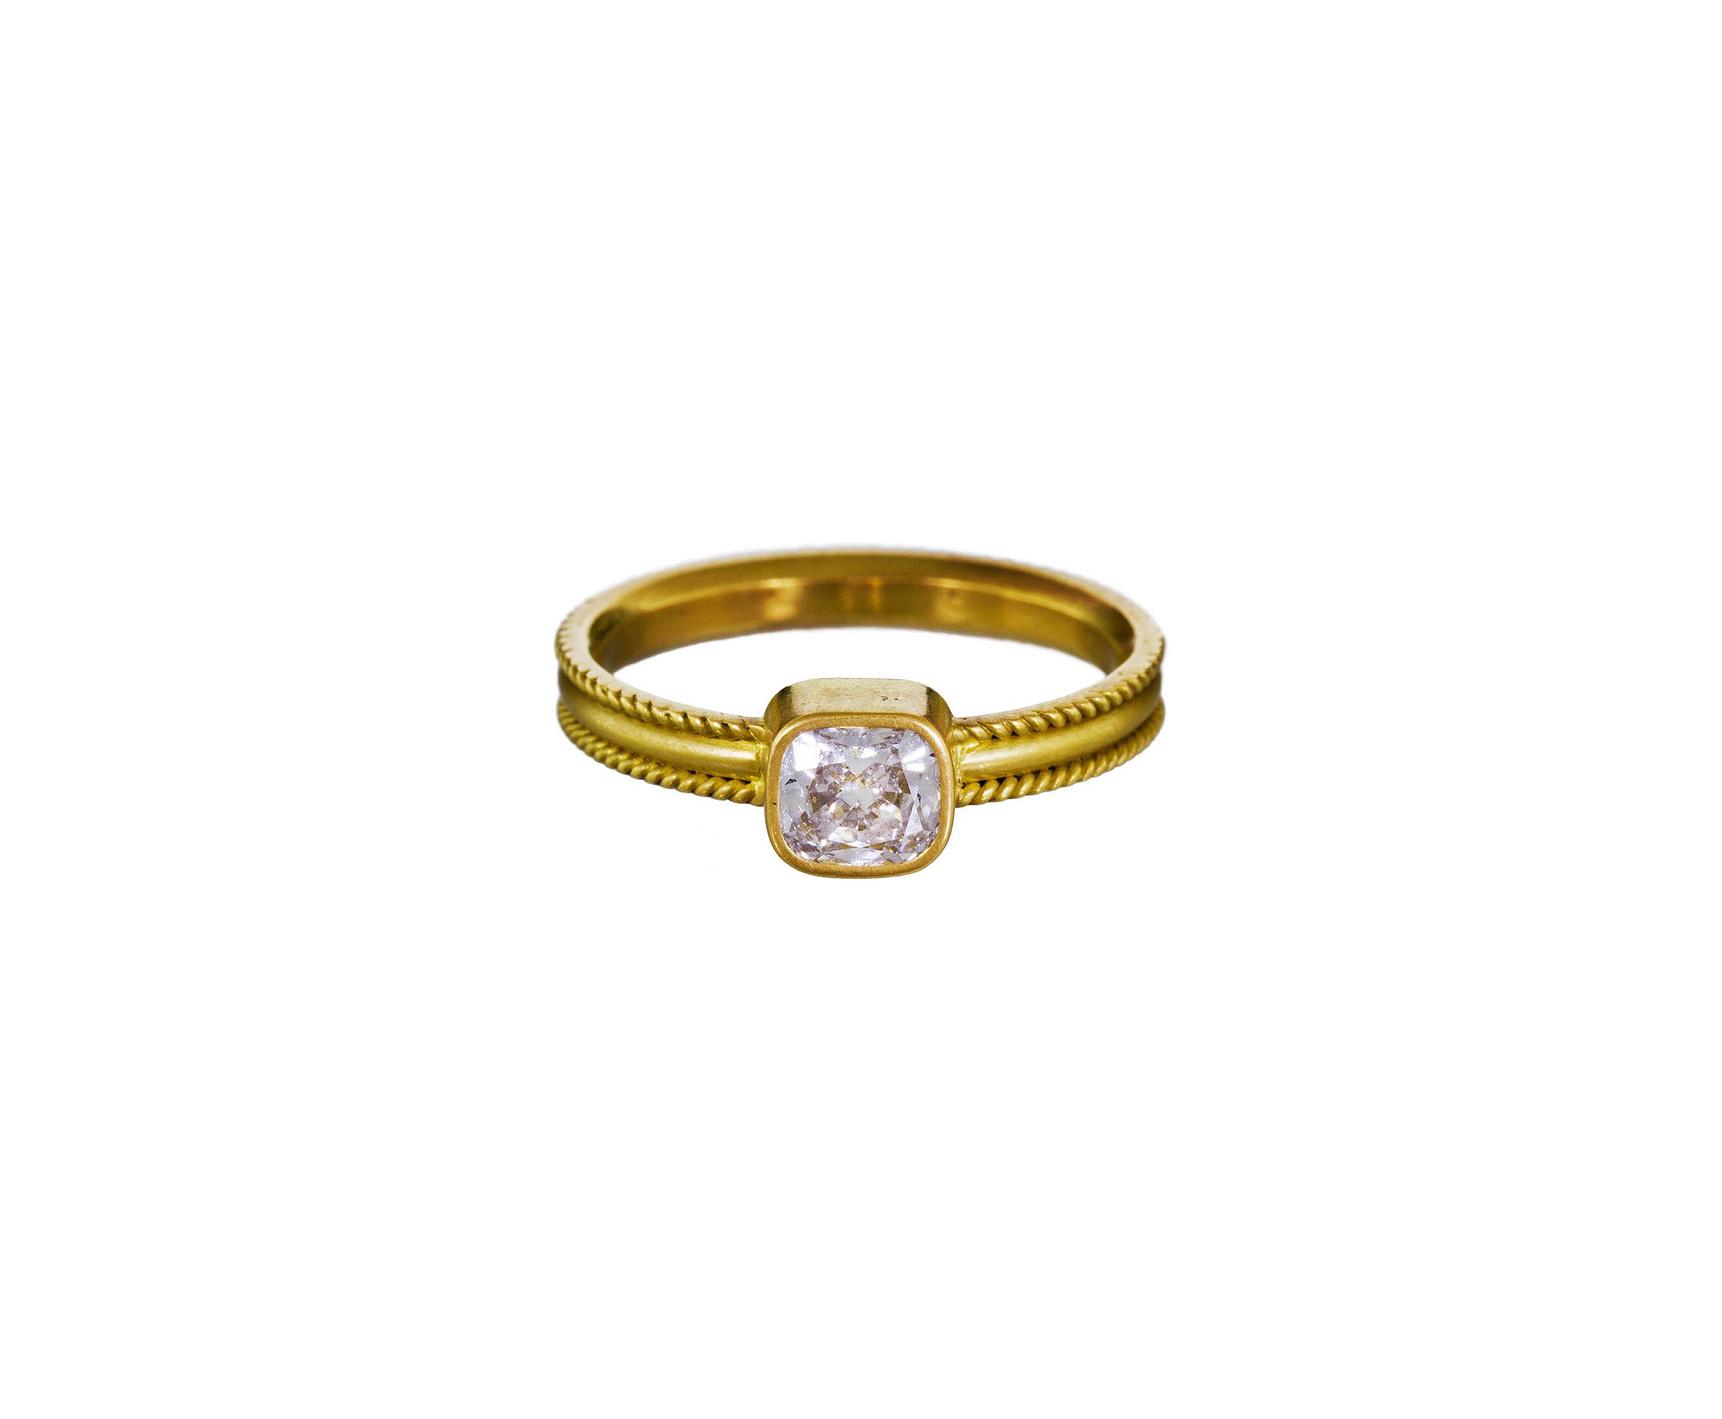 reinstein ross cushion cut diamond engagement ring gold band